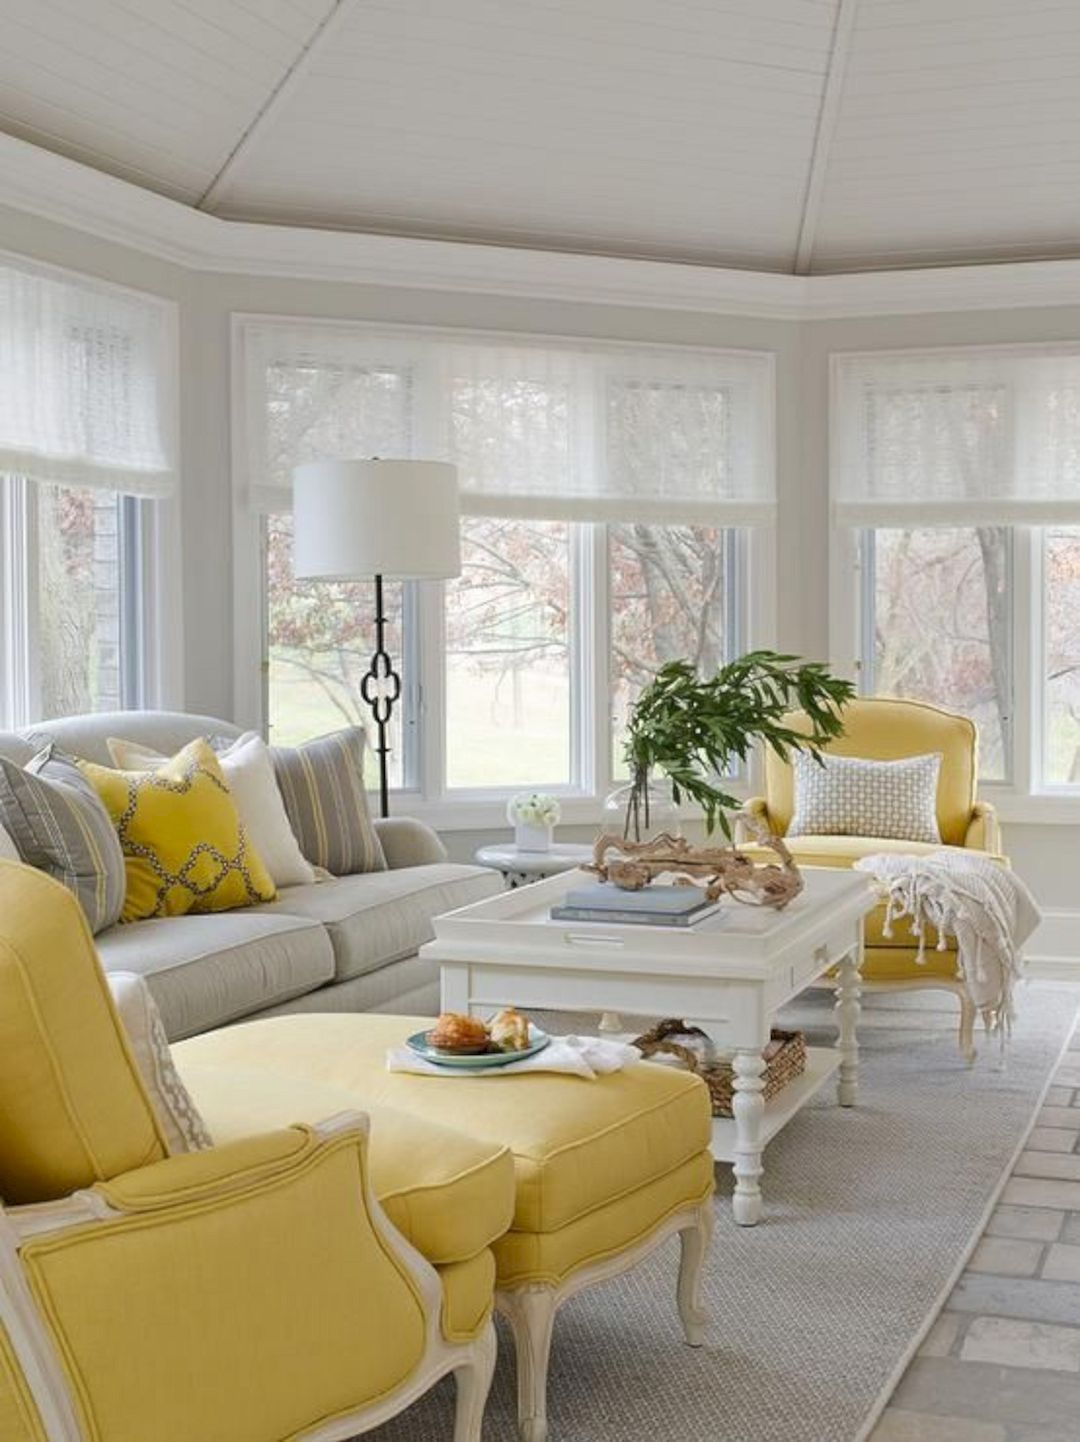 16 Furniture Ideas To Brighten Your Sunroom Sunroom